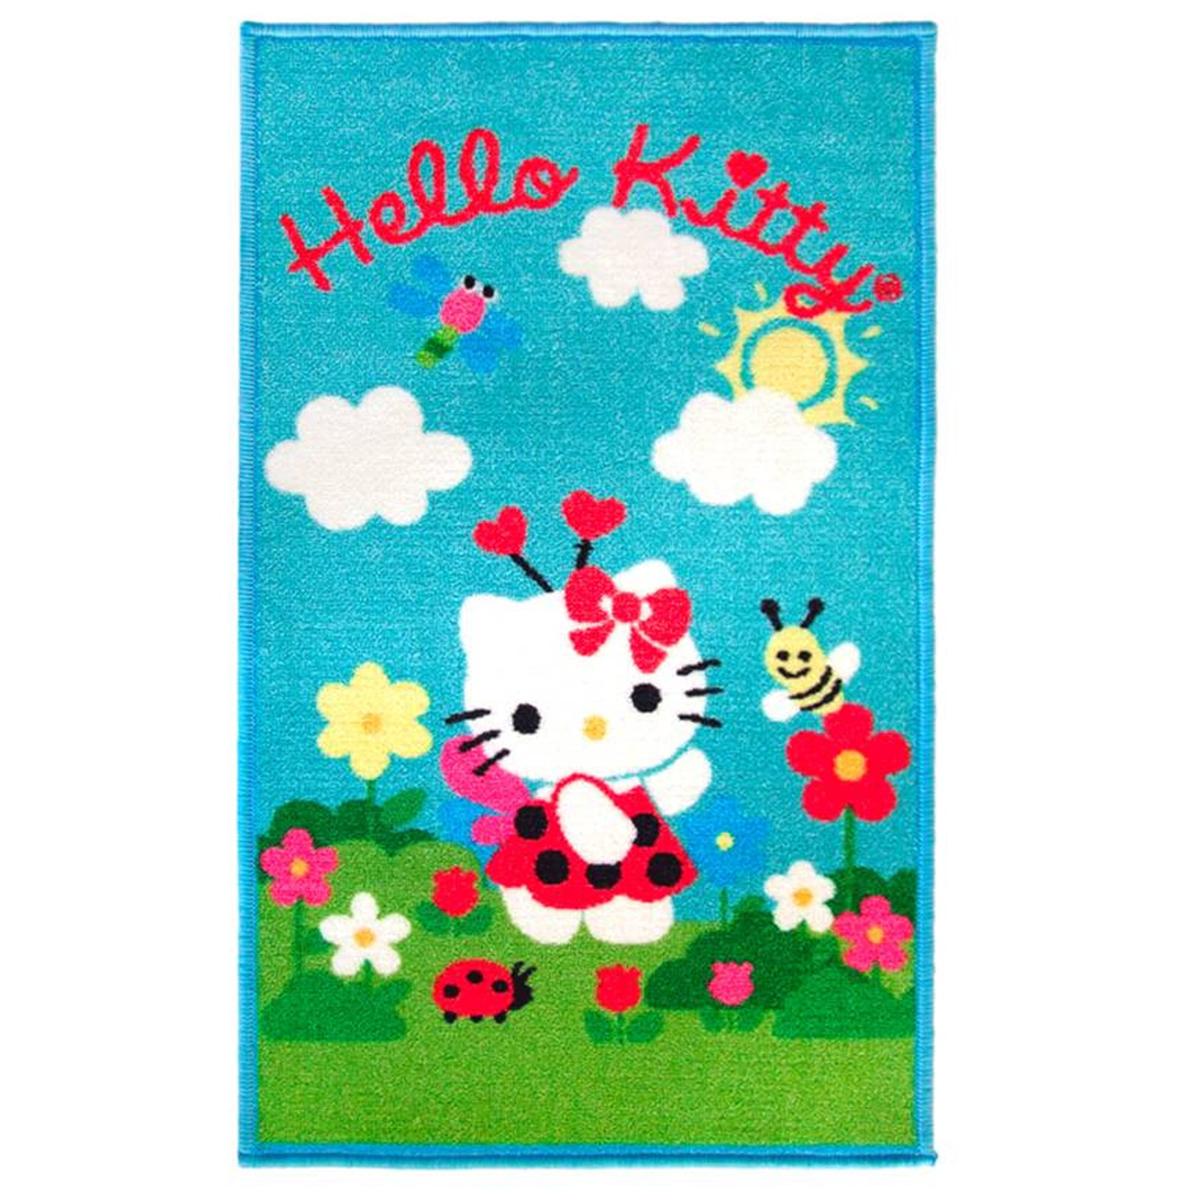 Tapis créateur \'Hello Kitty\' turquoise multicolore - 80x50 cm - [A2030]